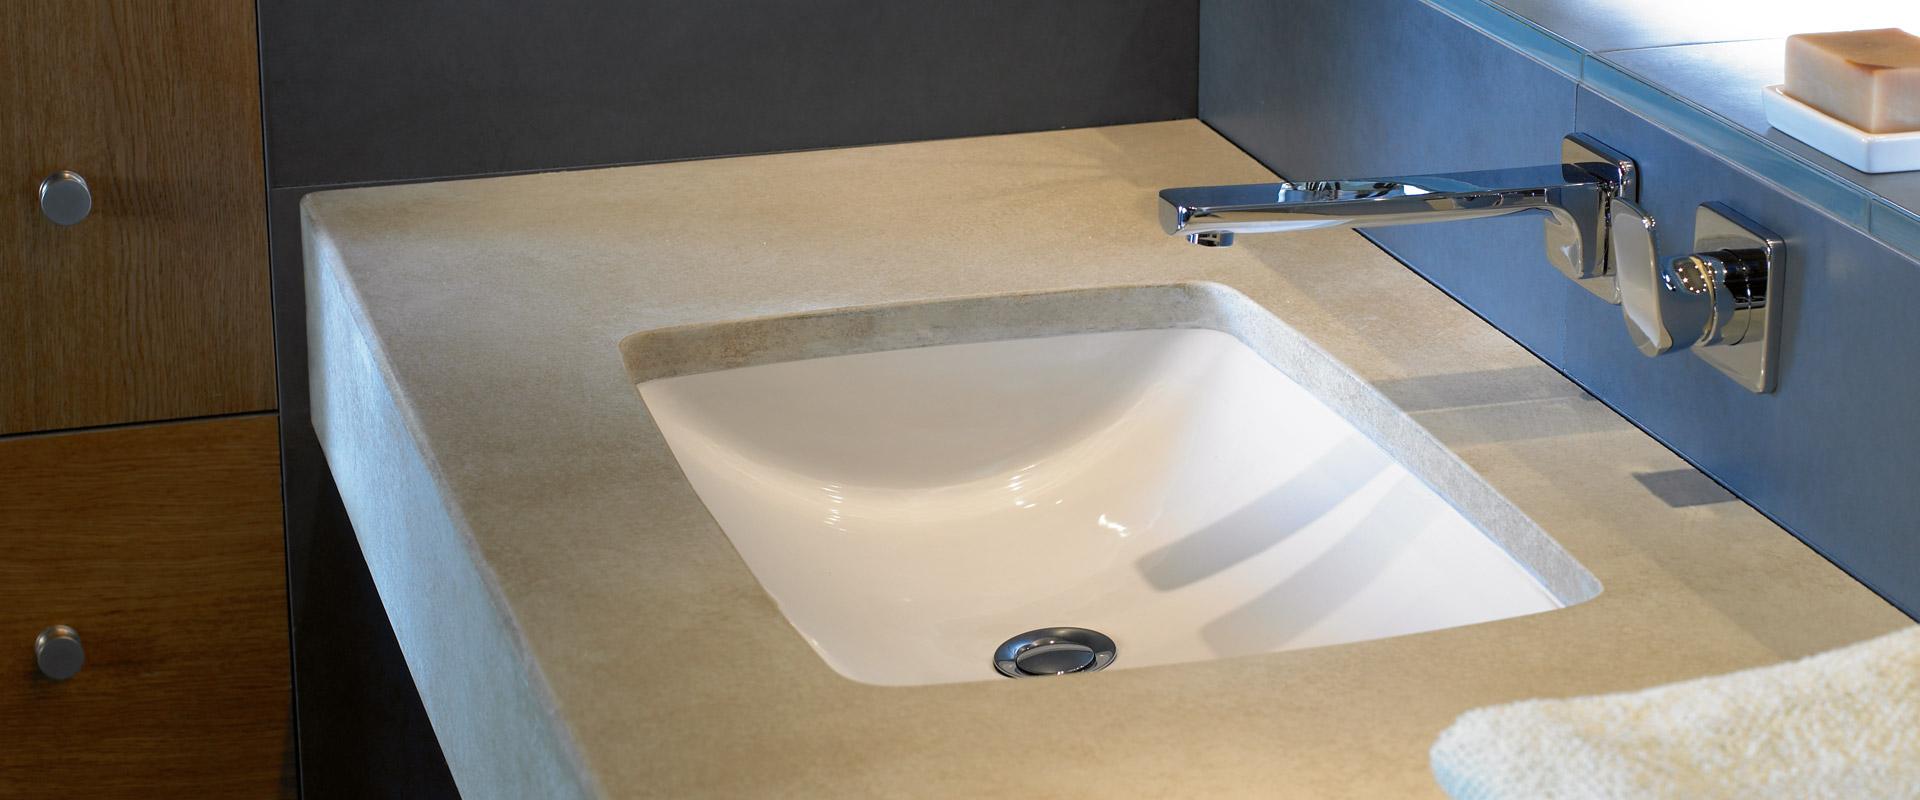 Twist Collection By Villeroy Boch Elegant Bathroom Design